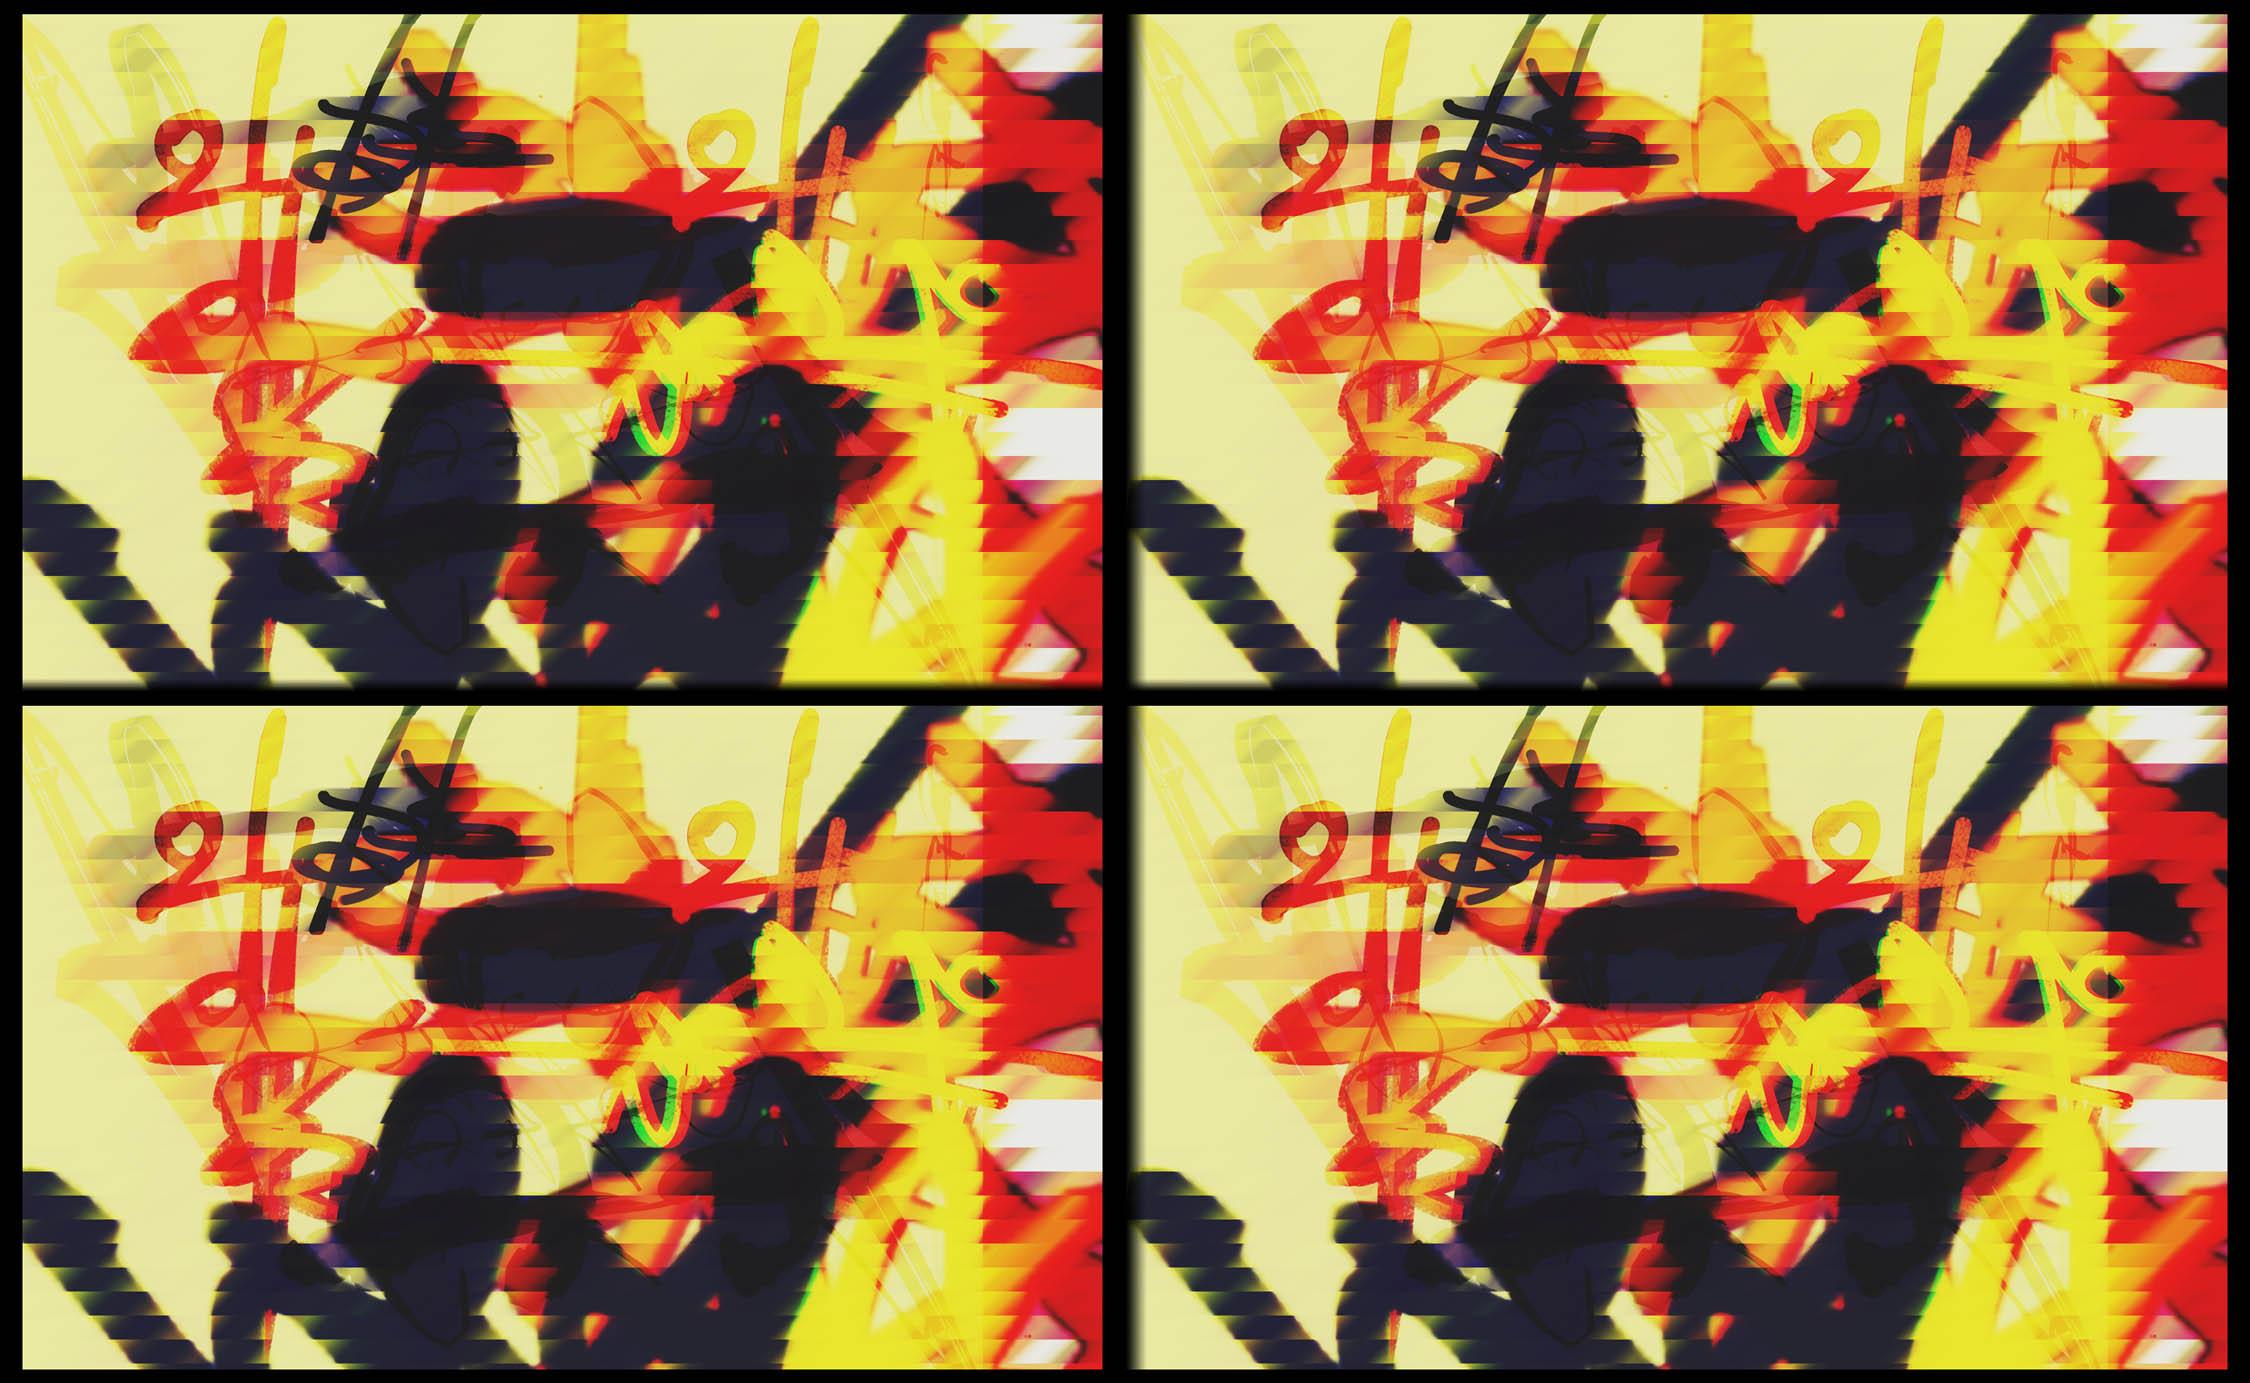 francesco aprile - asemic + glitch - 2016-03-08 (01)